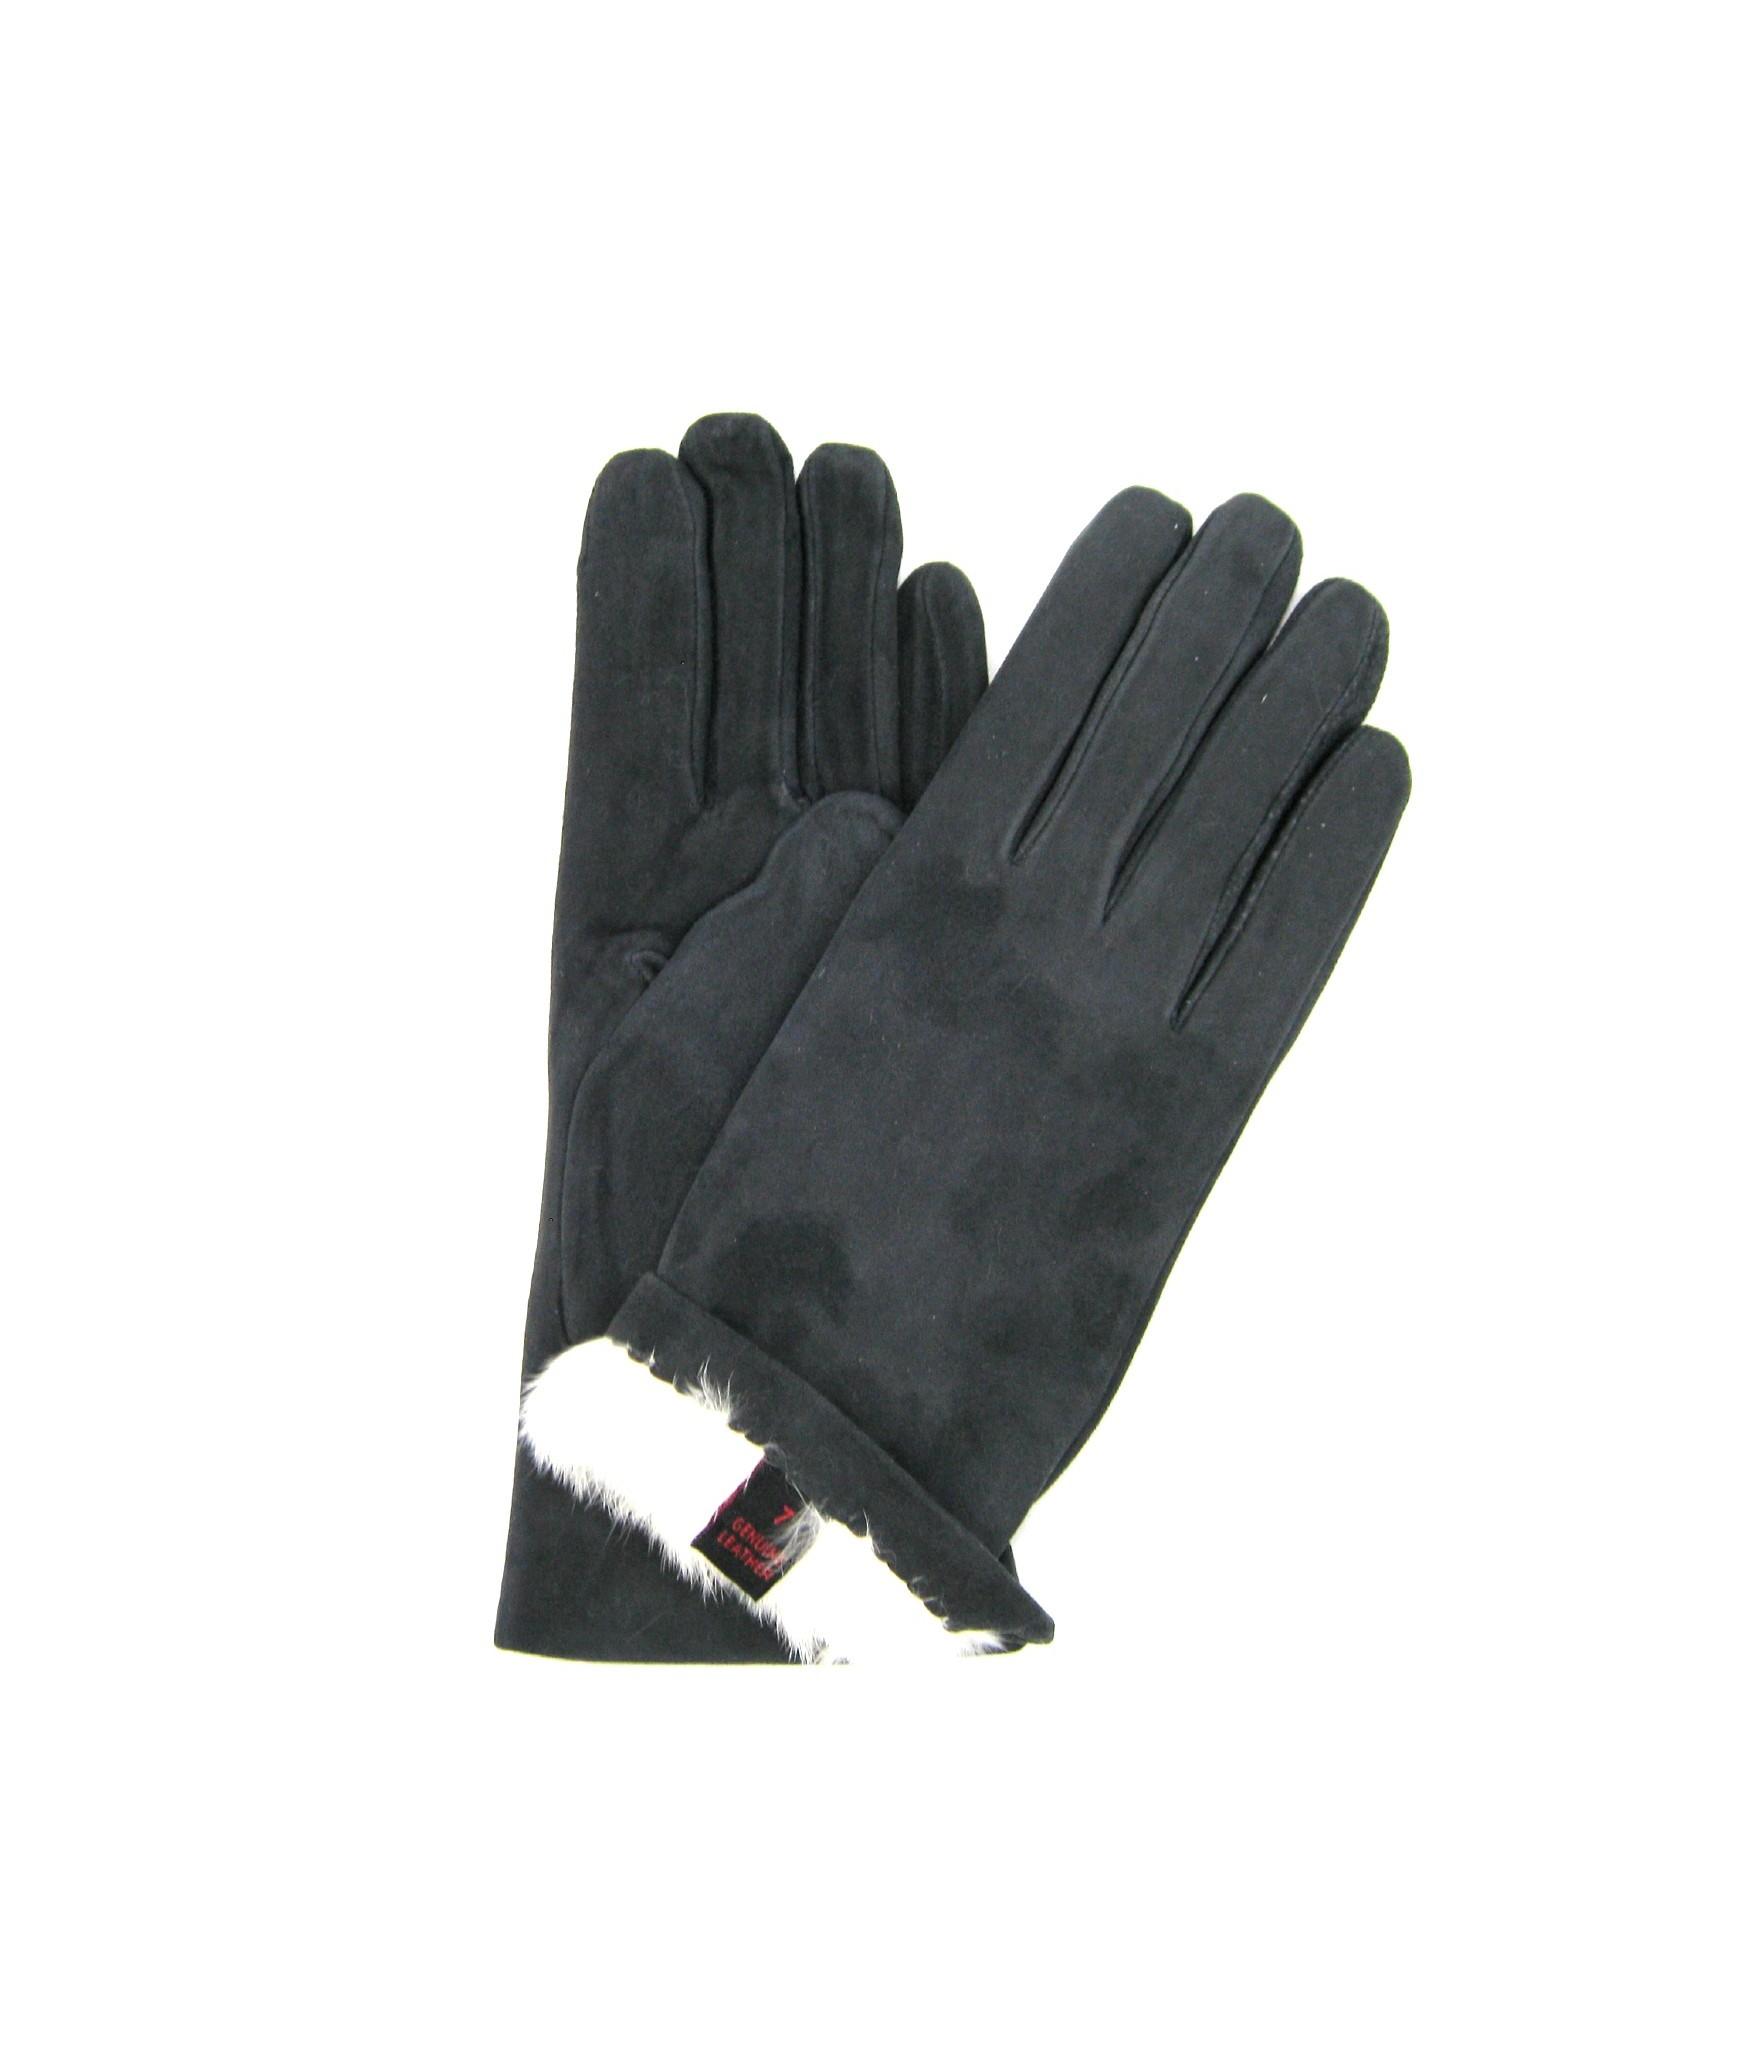 Suede Nappa leather gloves 2bt Rabbit fur lined Grey Sermoneta